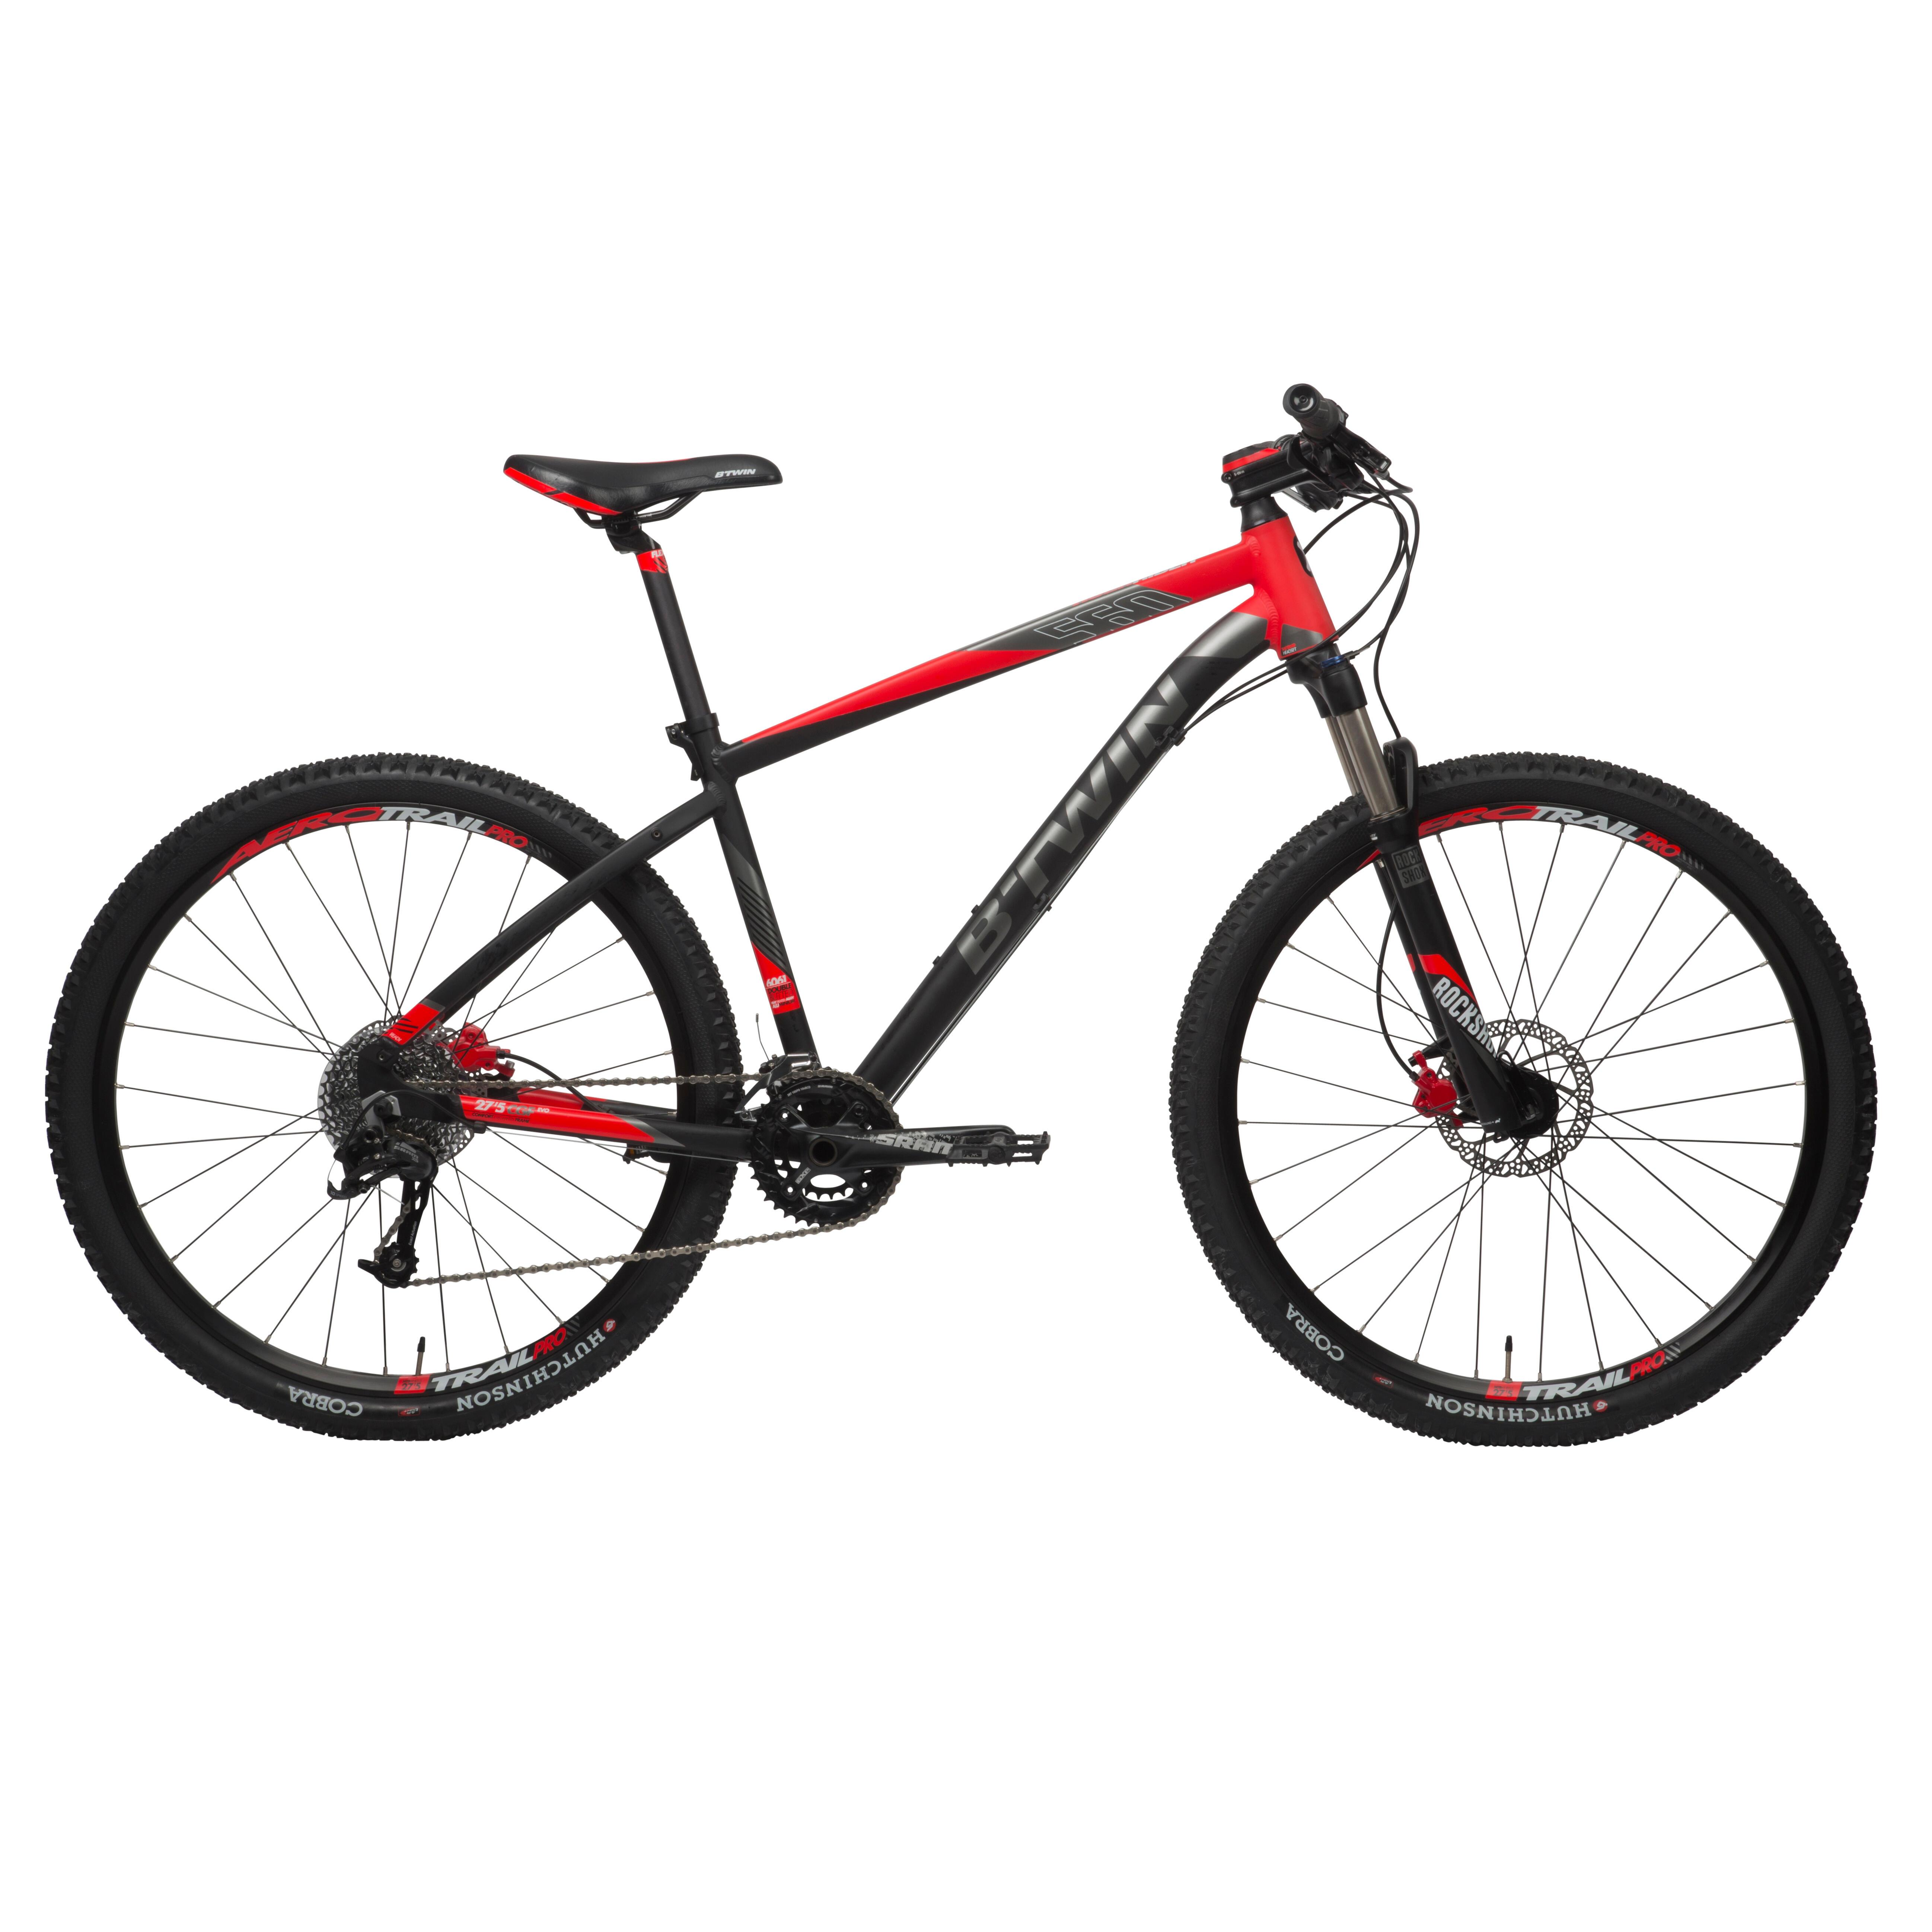 Rockrider MTB ROCKRIDER 560 27.5 SRAM 2x10-speed mountainbike